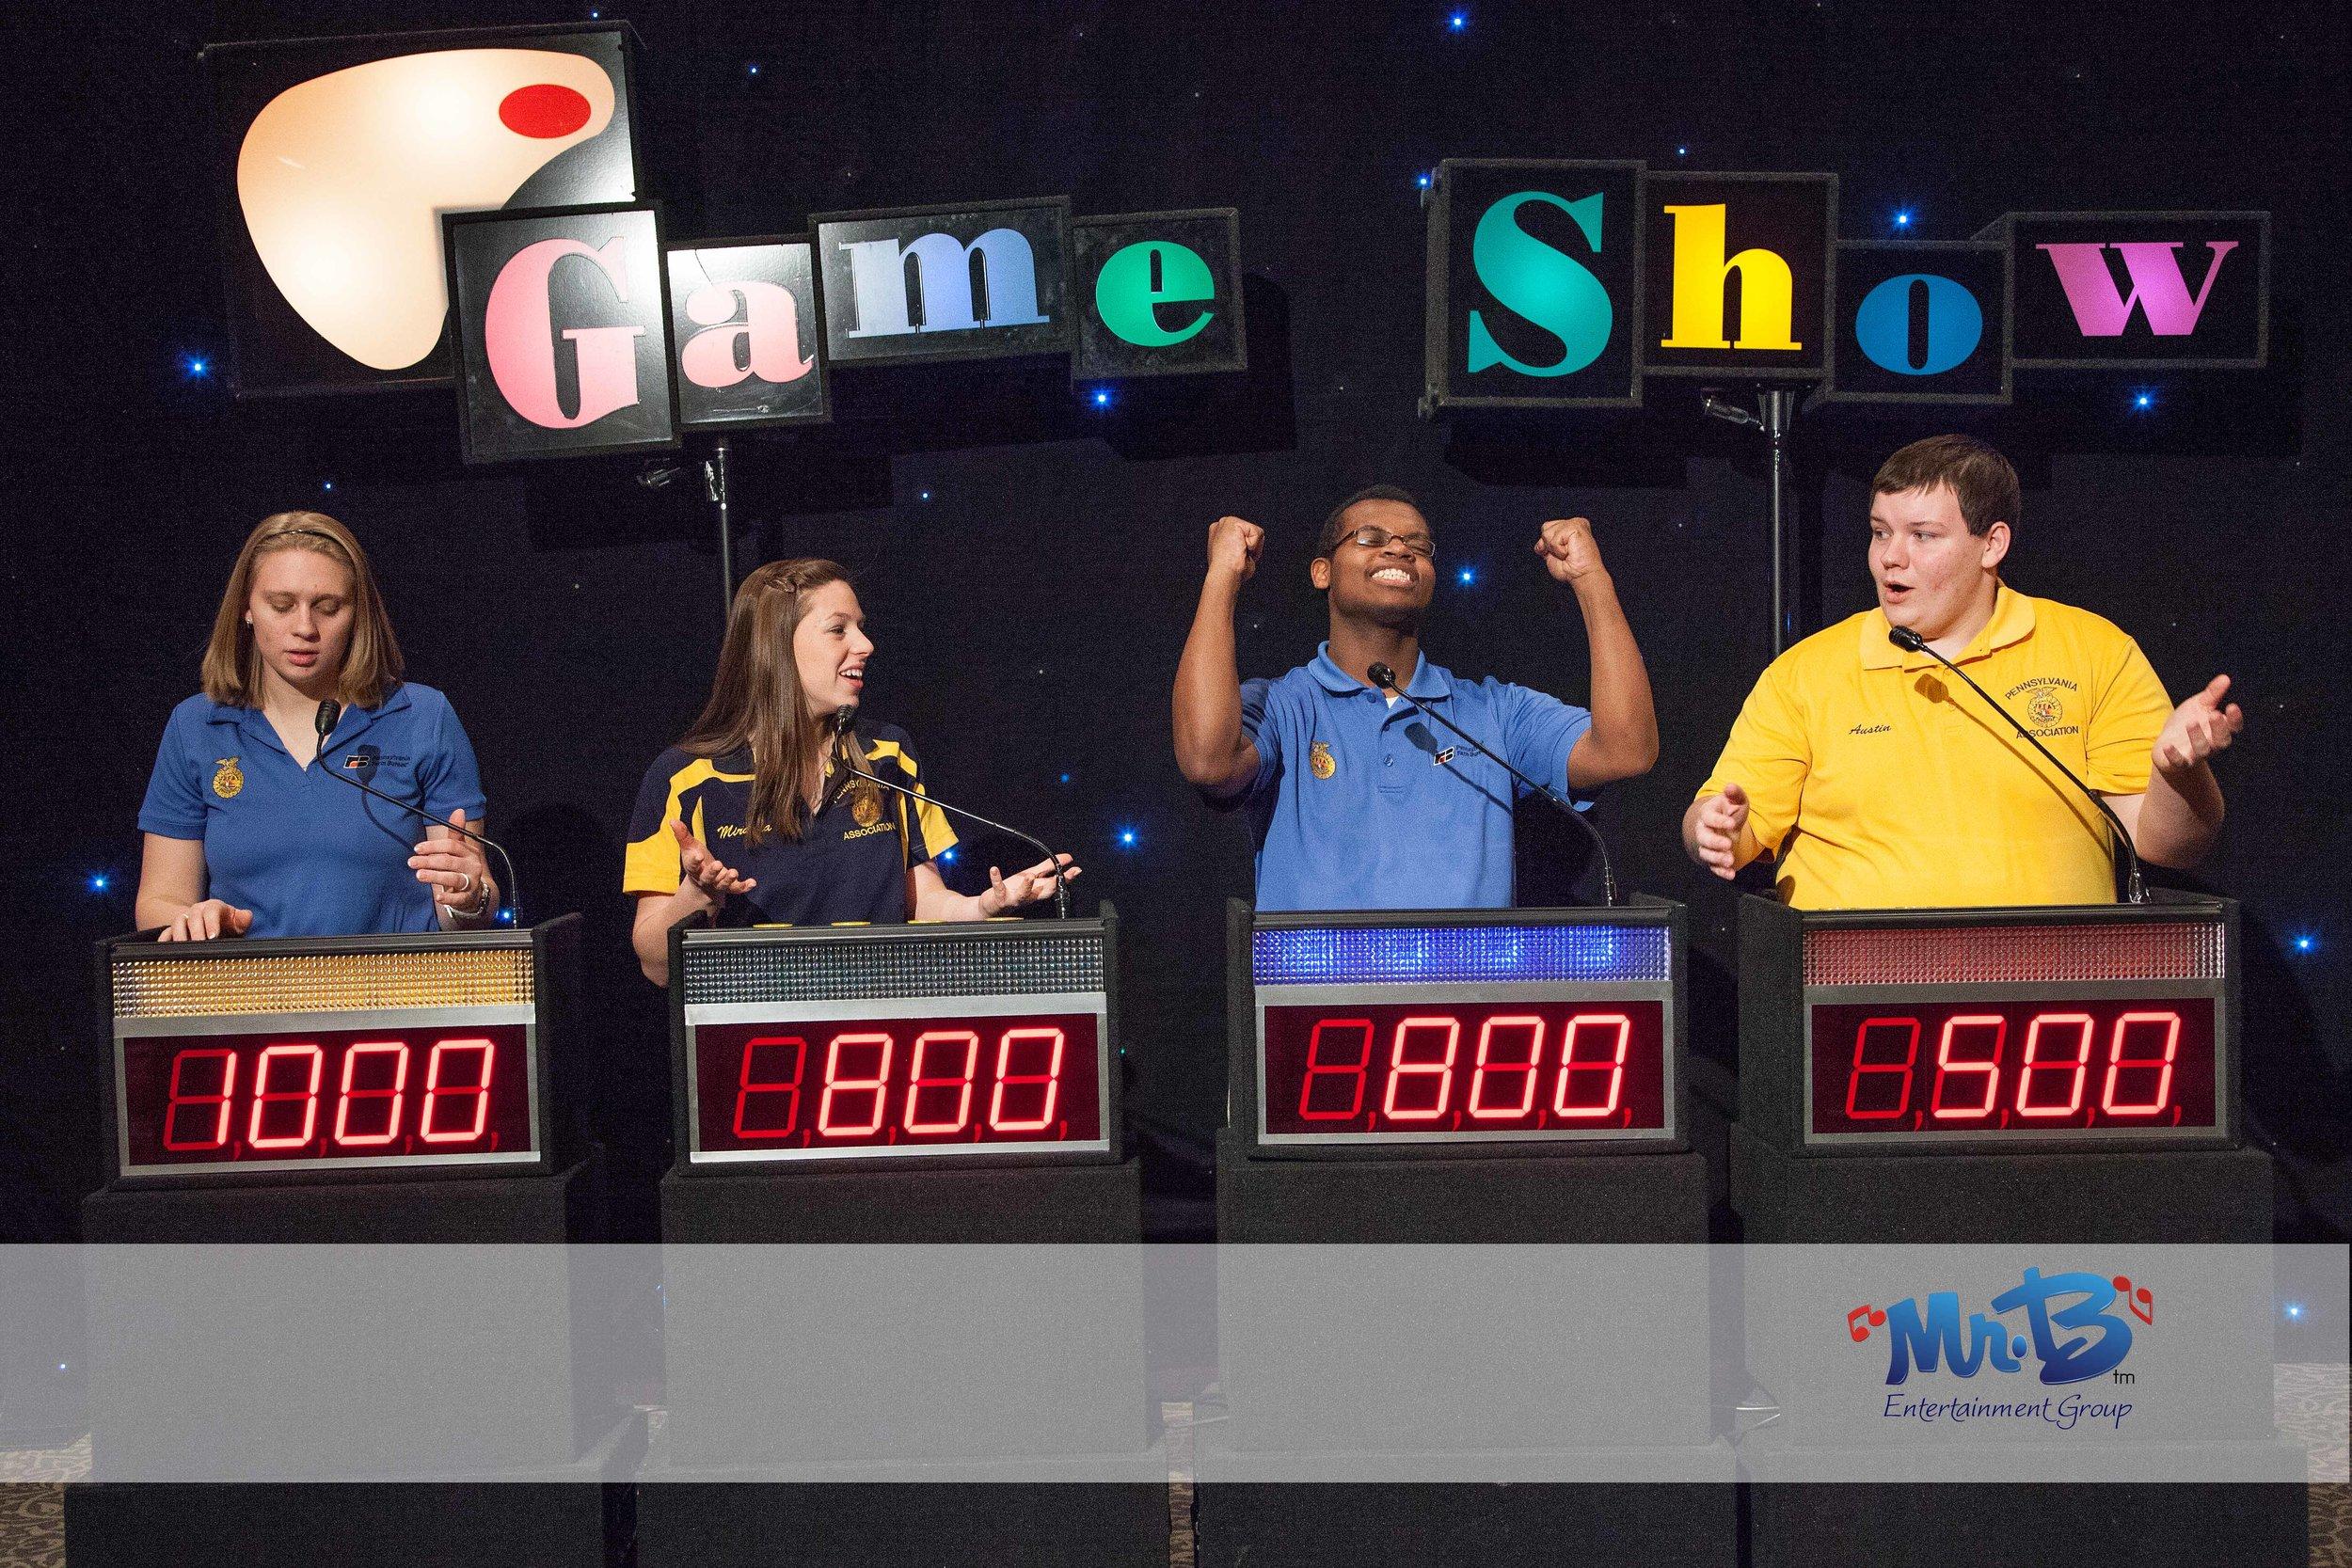 Game Show LR.jpg